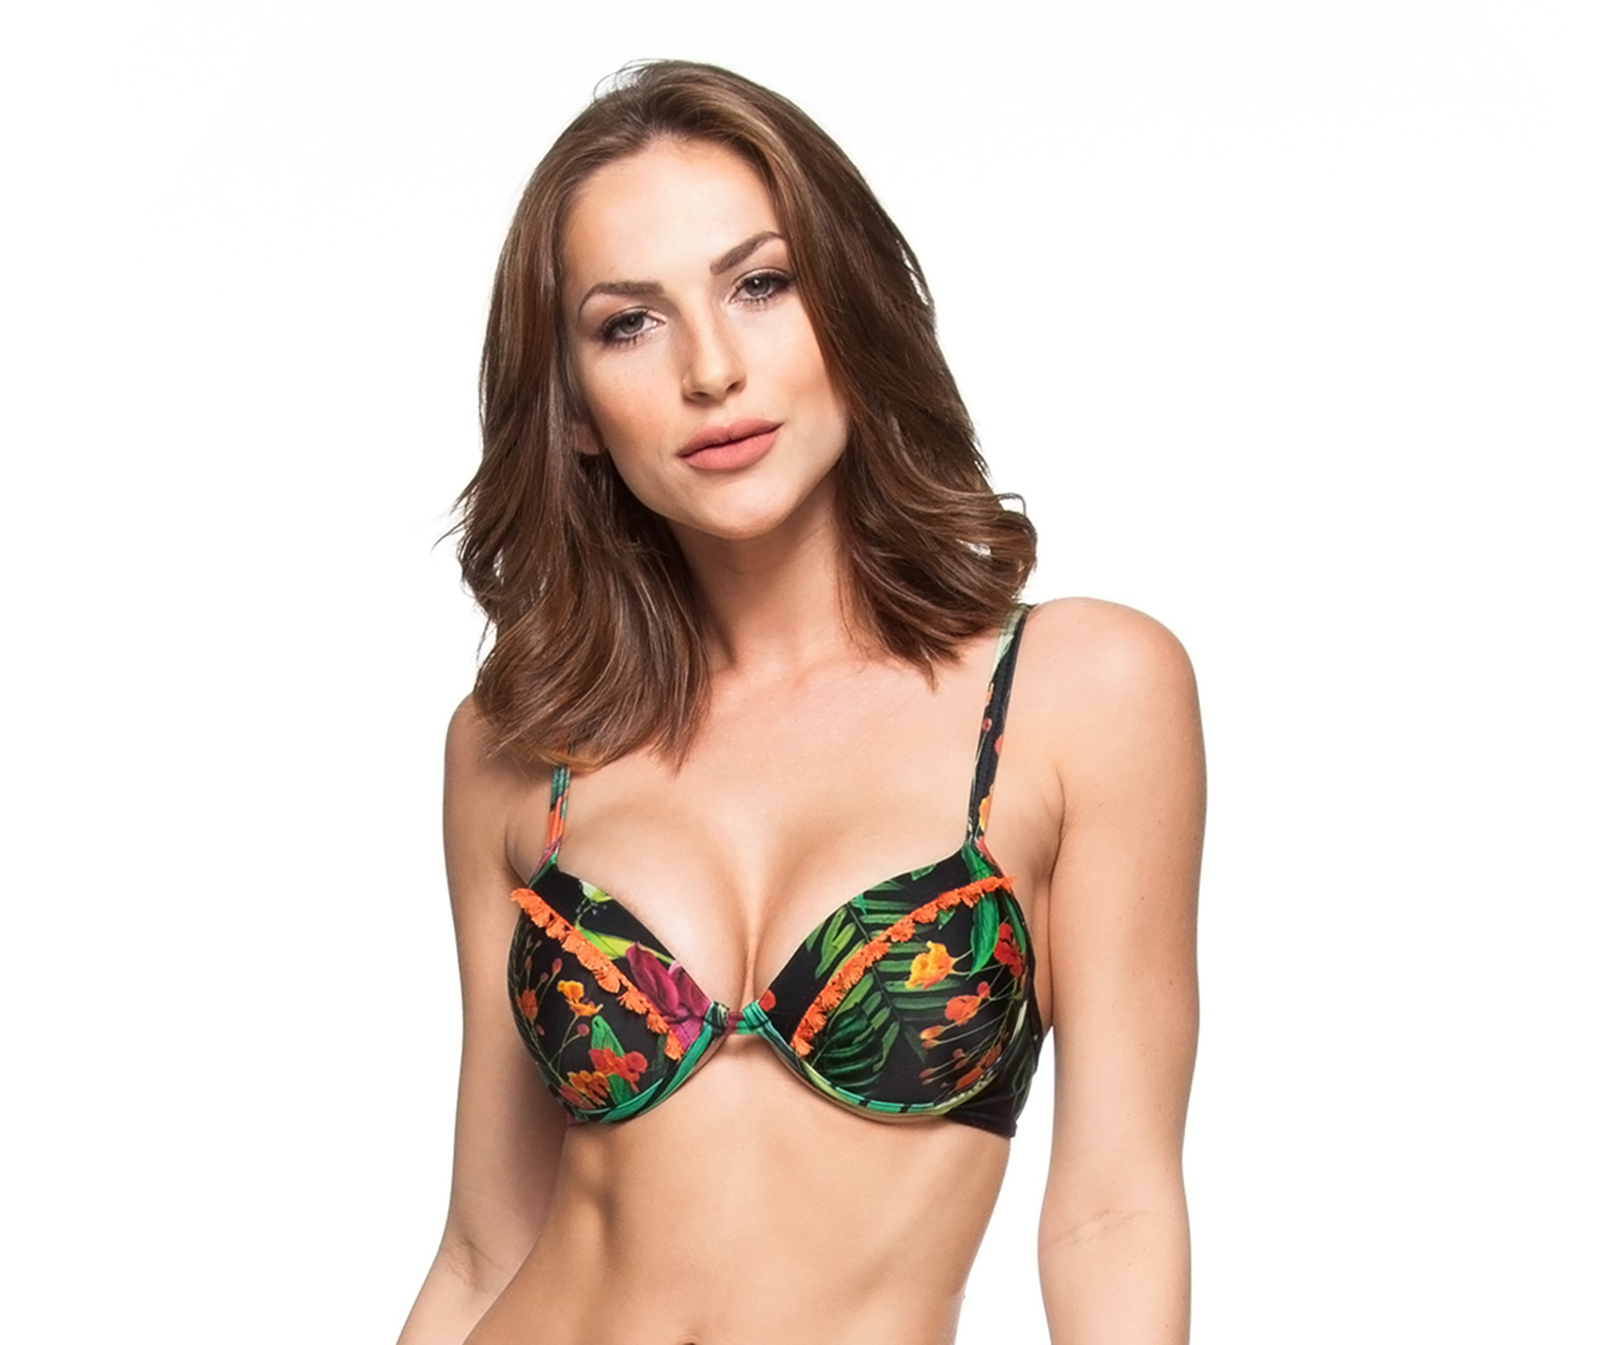 3a5bfb48dd Black balconette push-up bikini top with floral print - TOP RIO VERDE ...